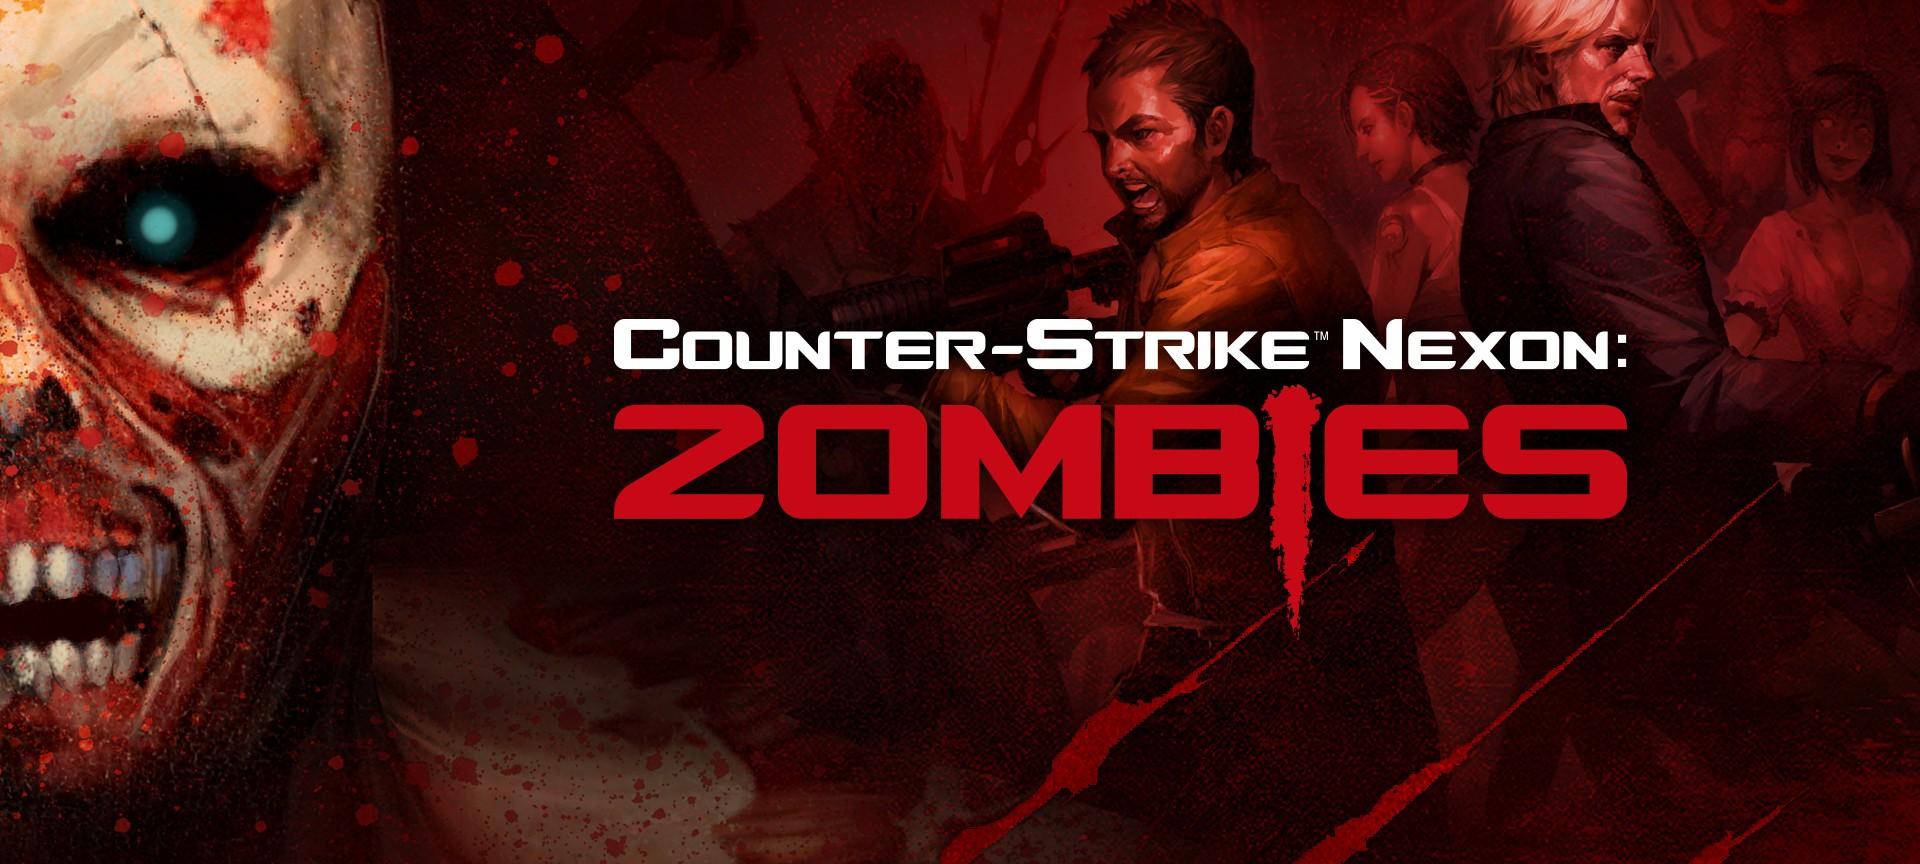 Counter-Strike-Nexon-Zombies_Key-visual-e1407424708942